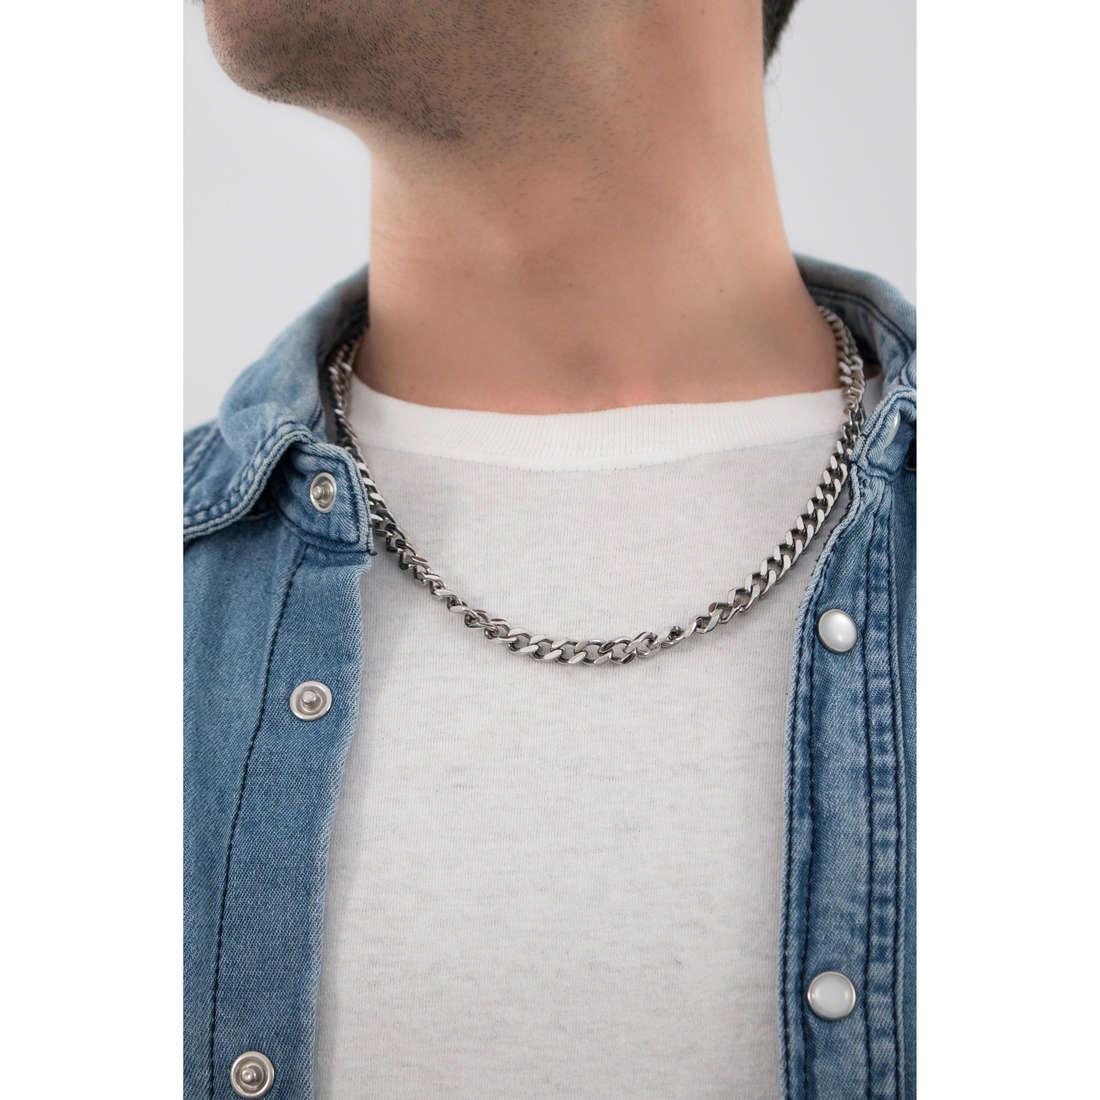 Cesare Paciotti necklaces man JPCL0037B indosso